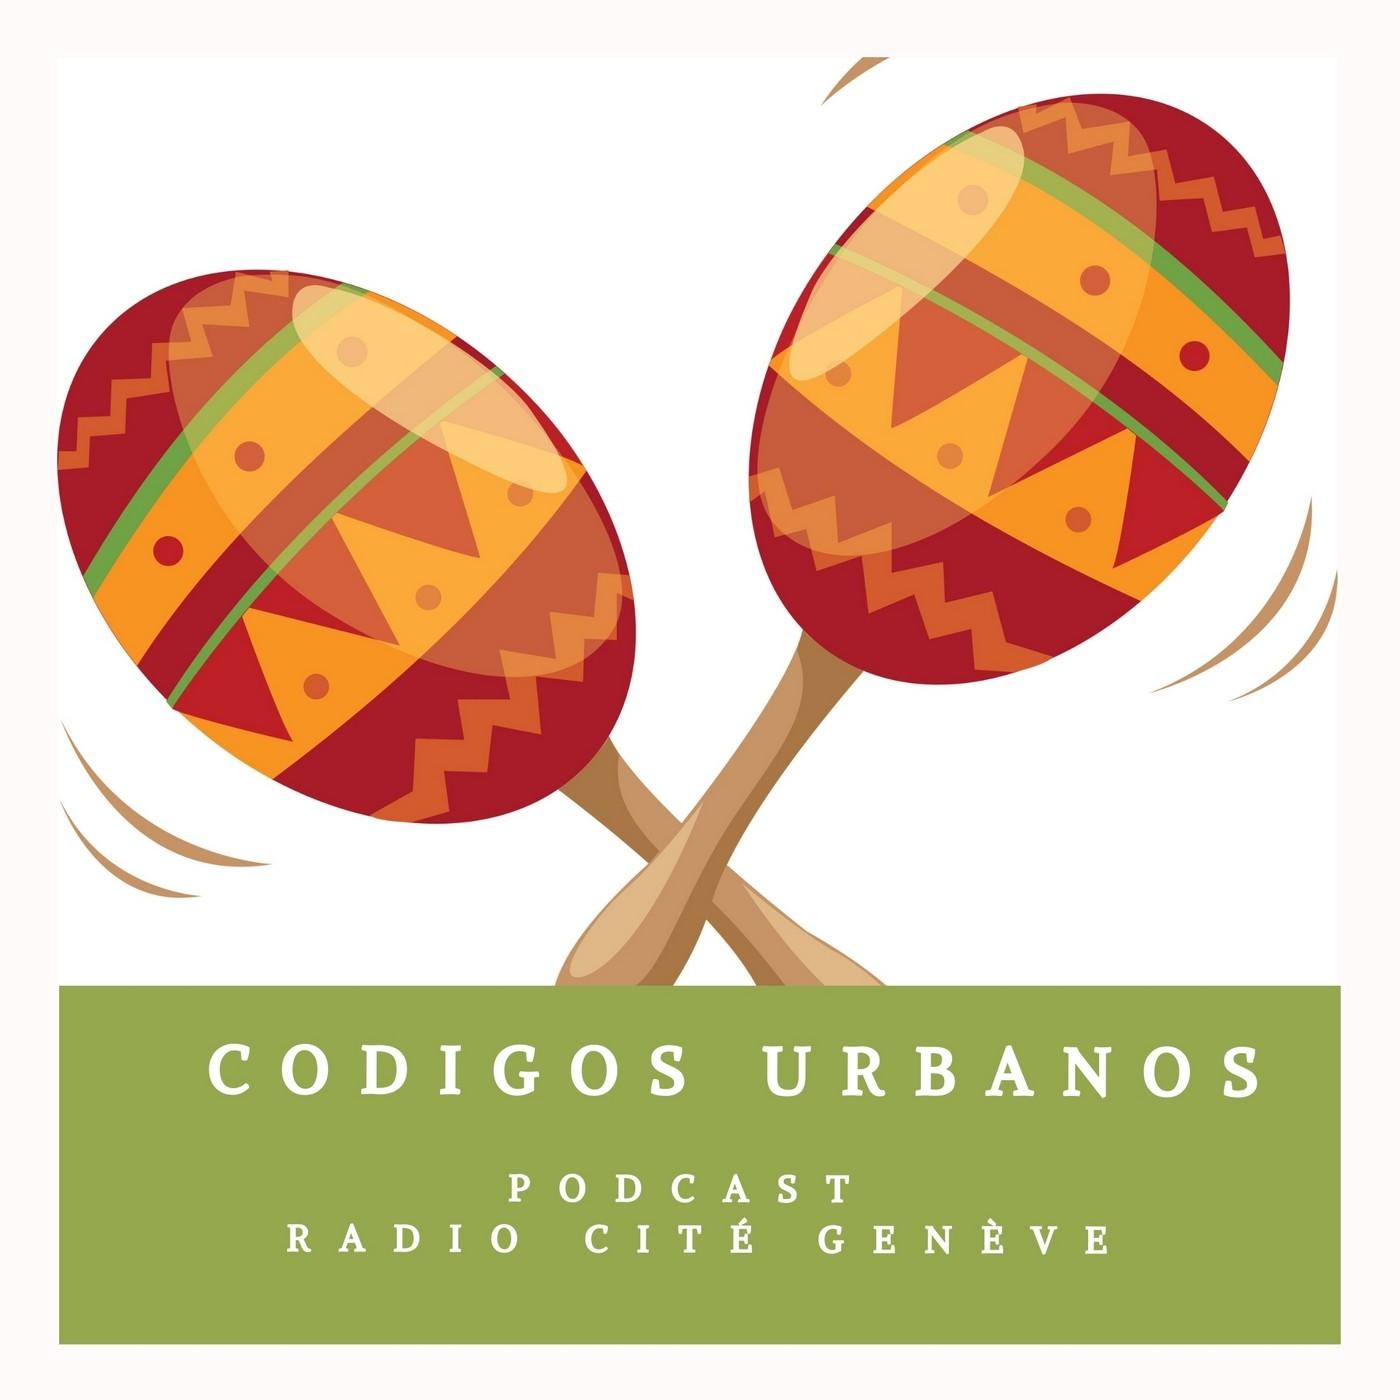 Codigos Urbanos - 16/03/21